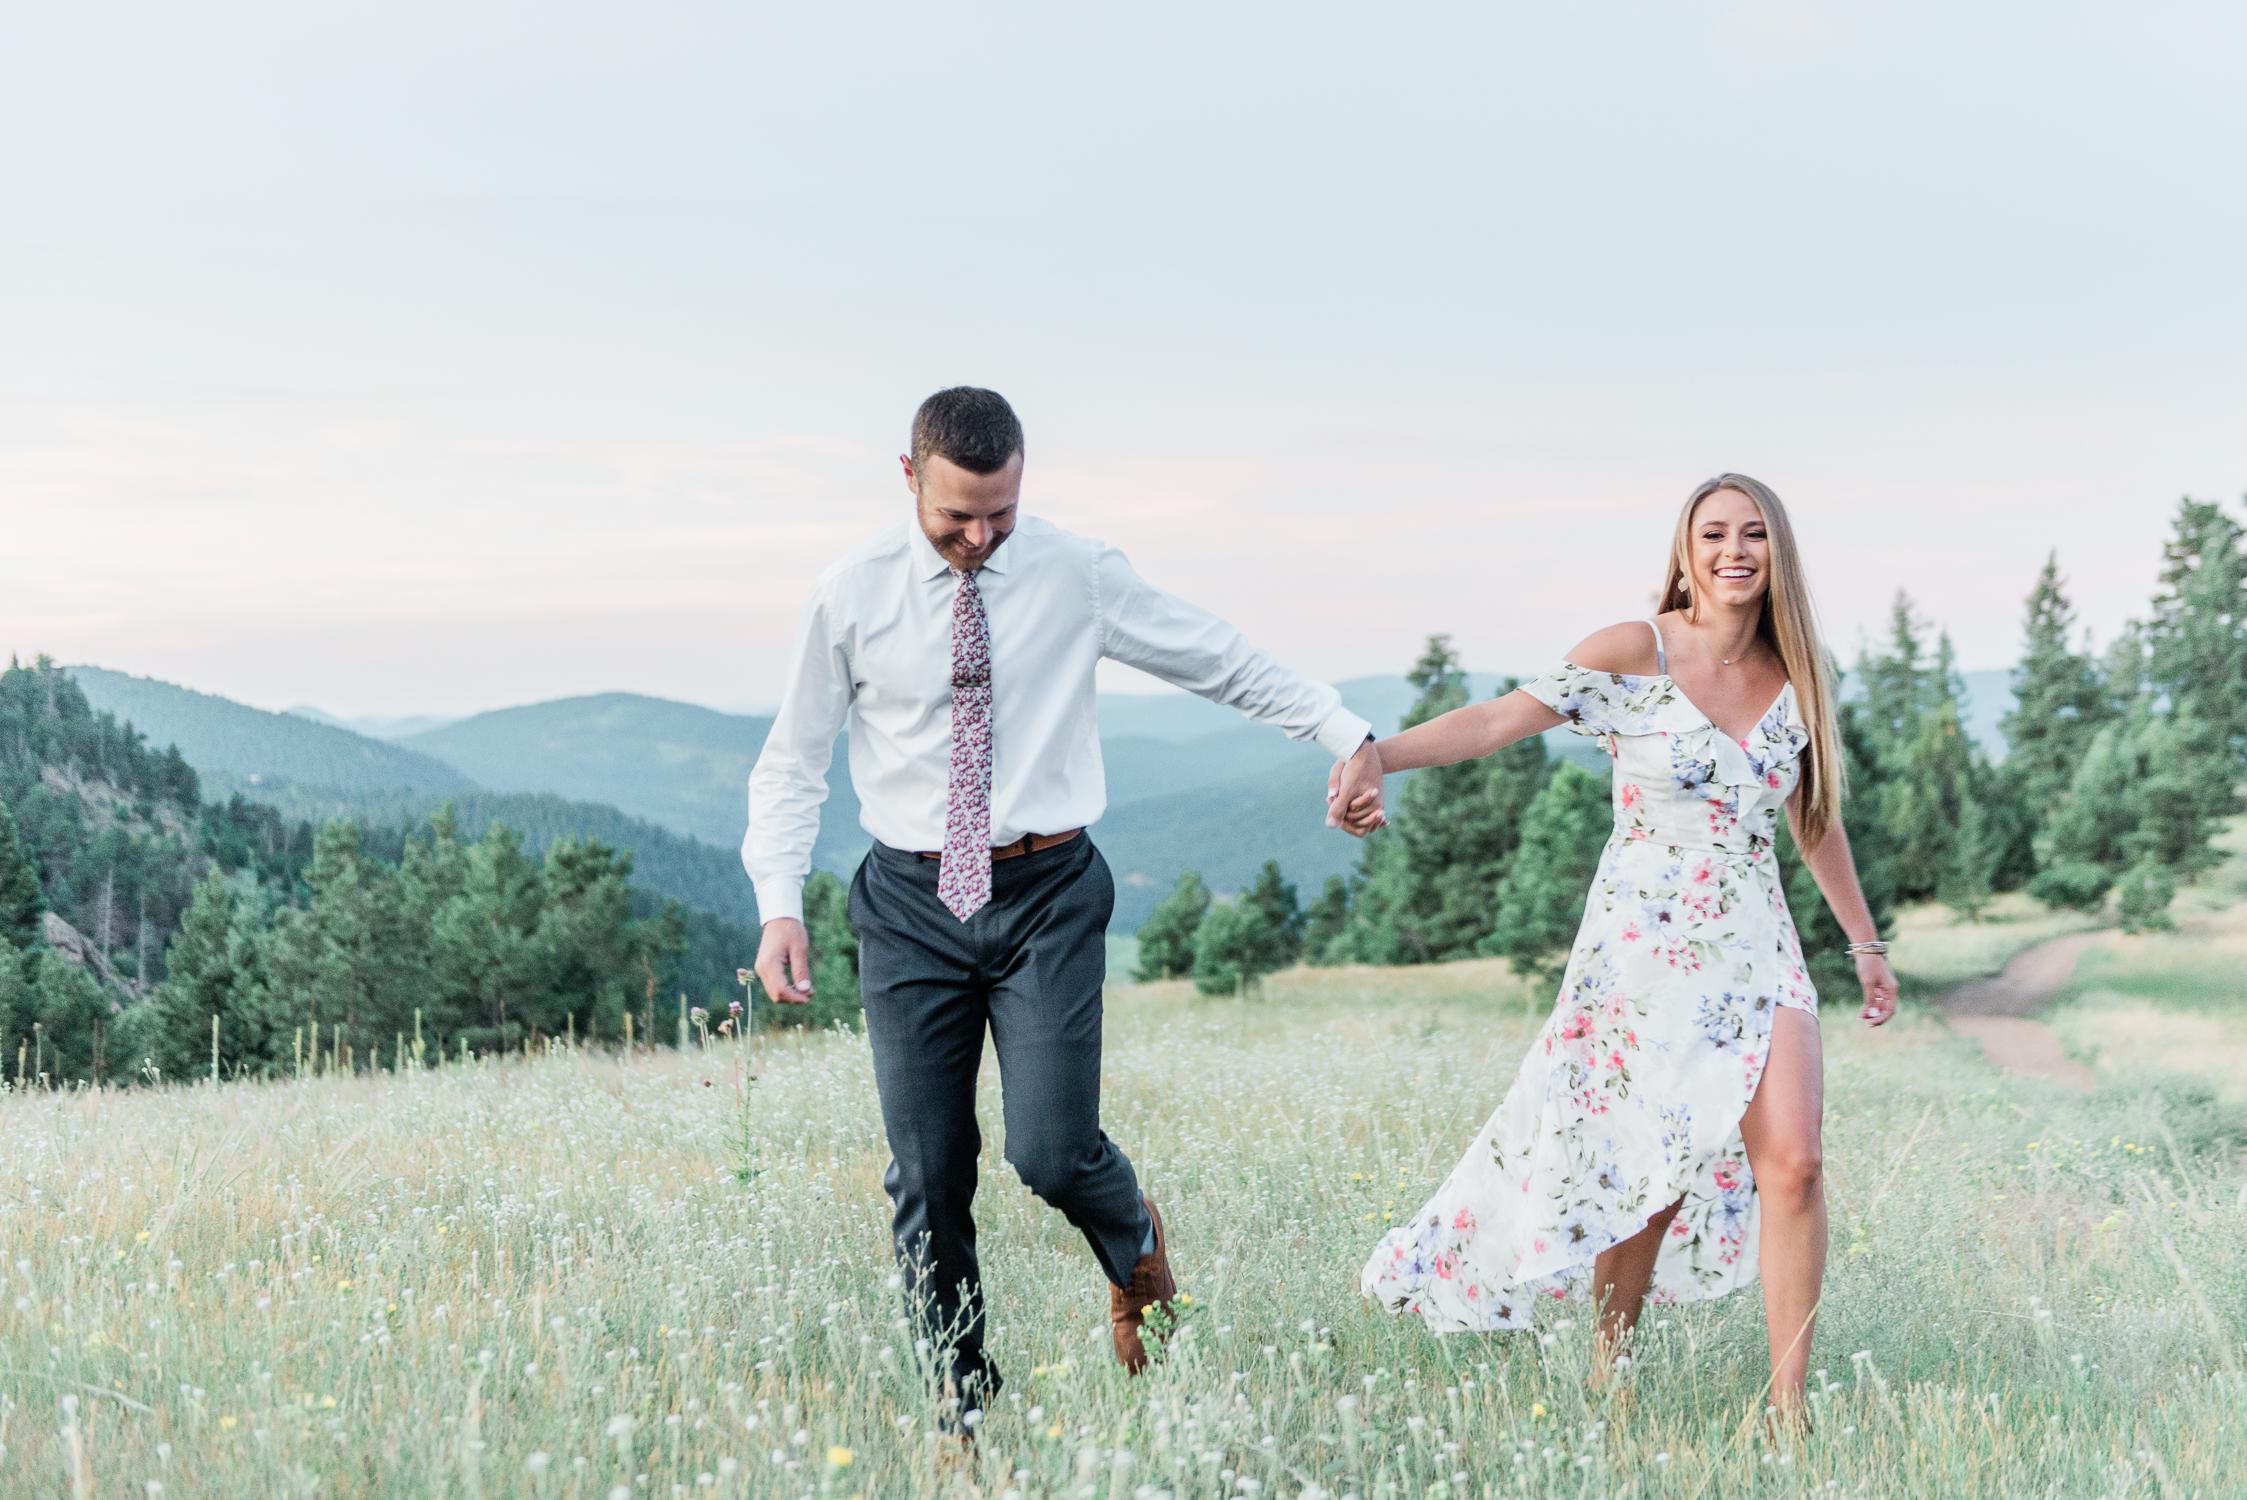 2019-08-30-Engagement-Morgan-Adam-MtFalcon-1025.jpg